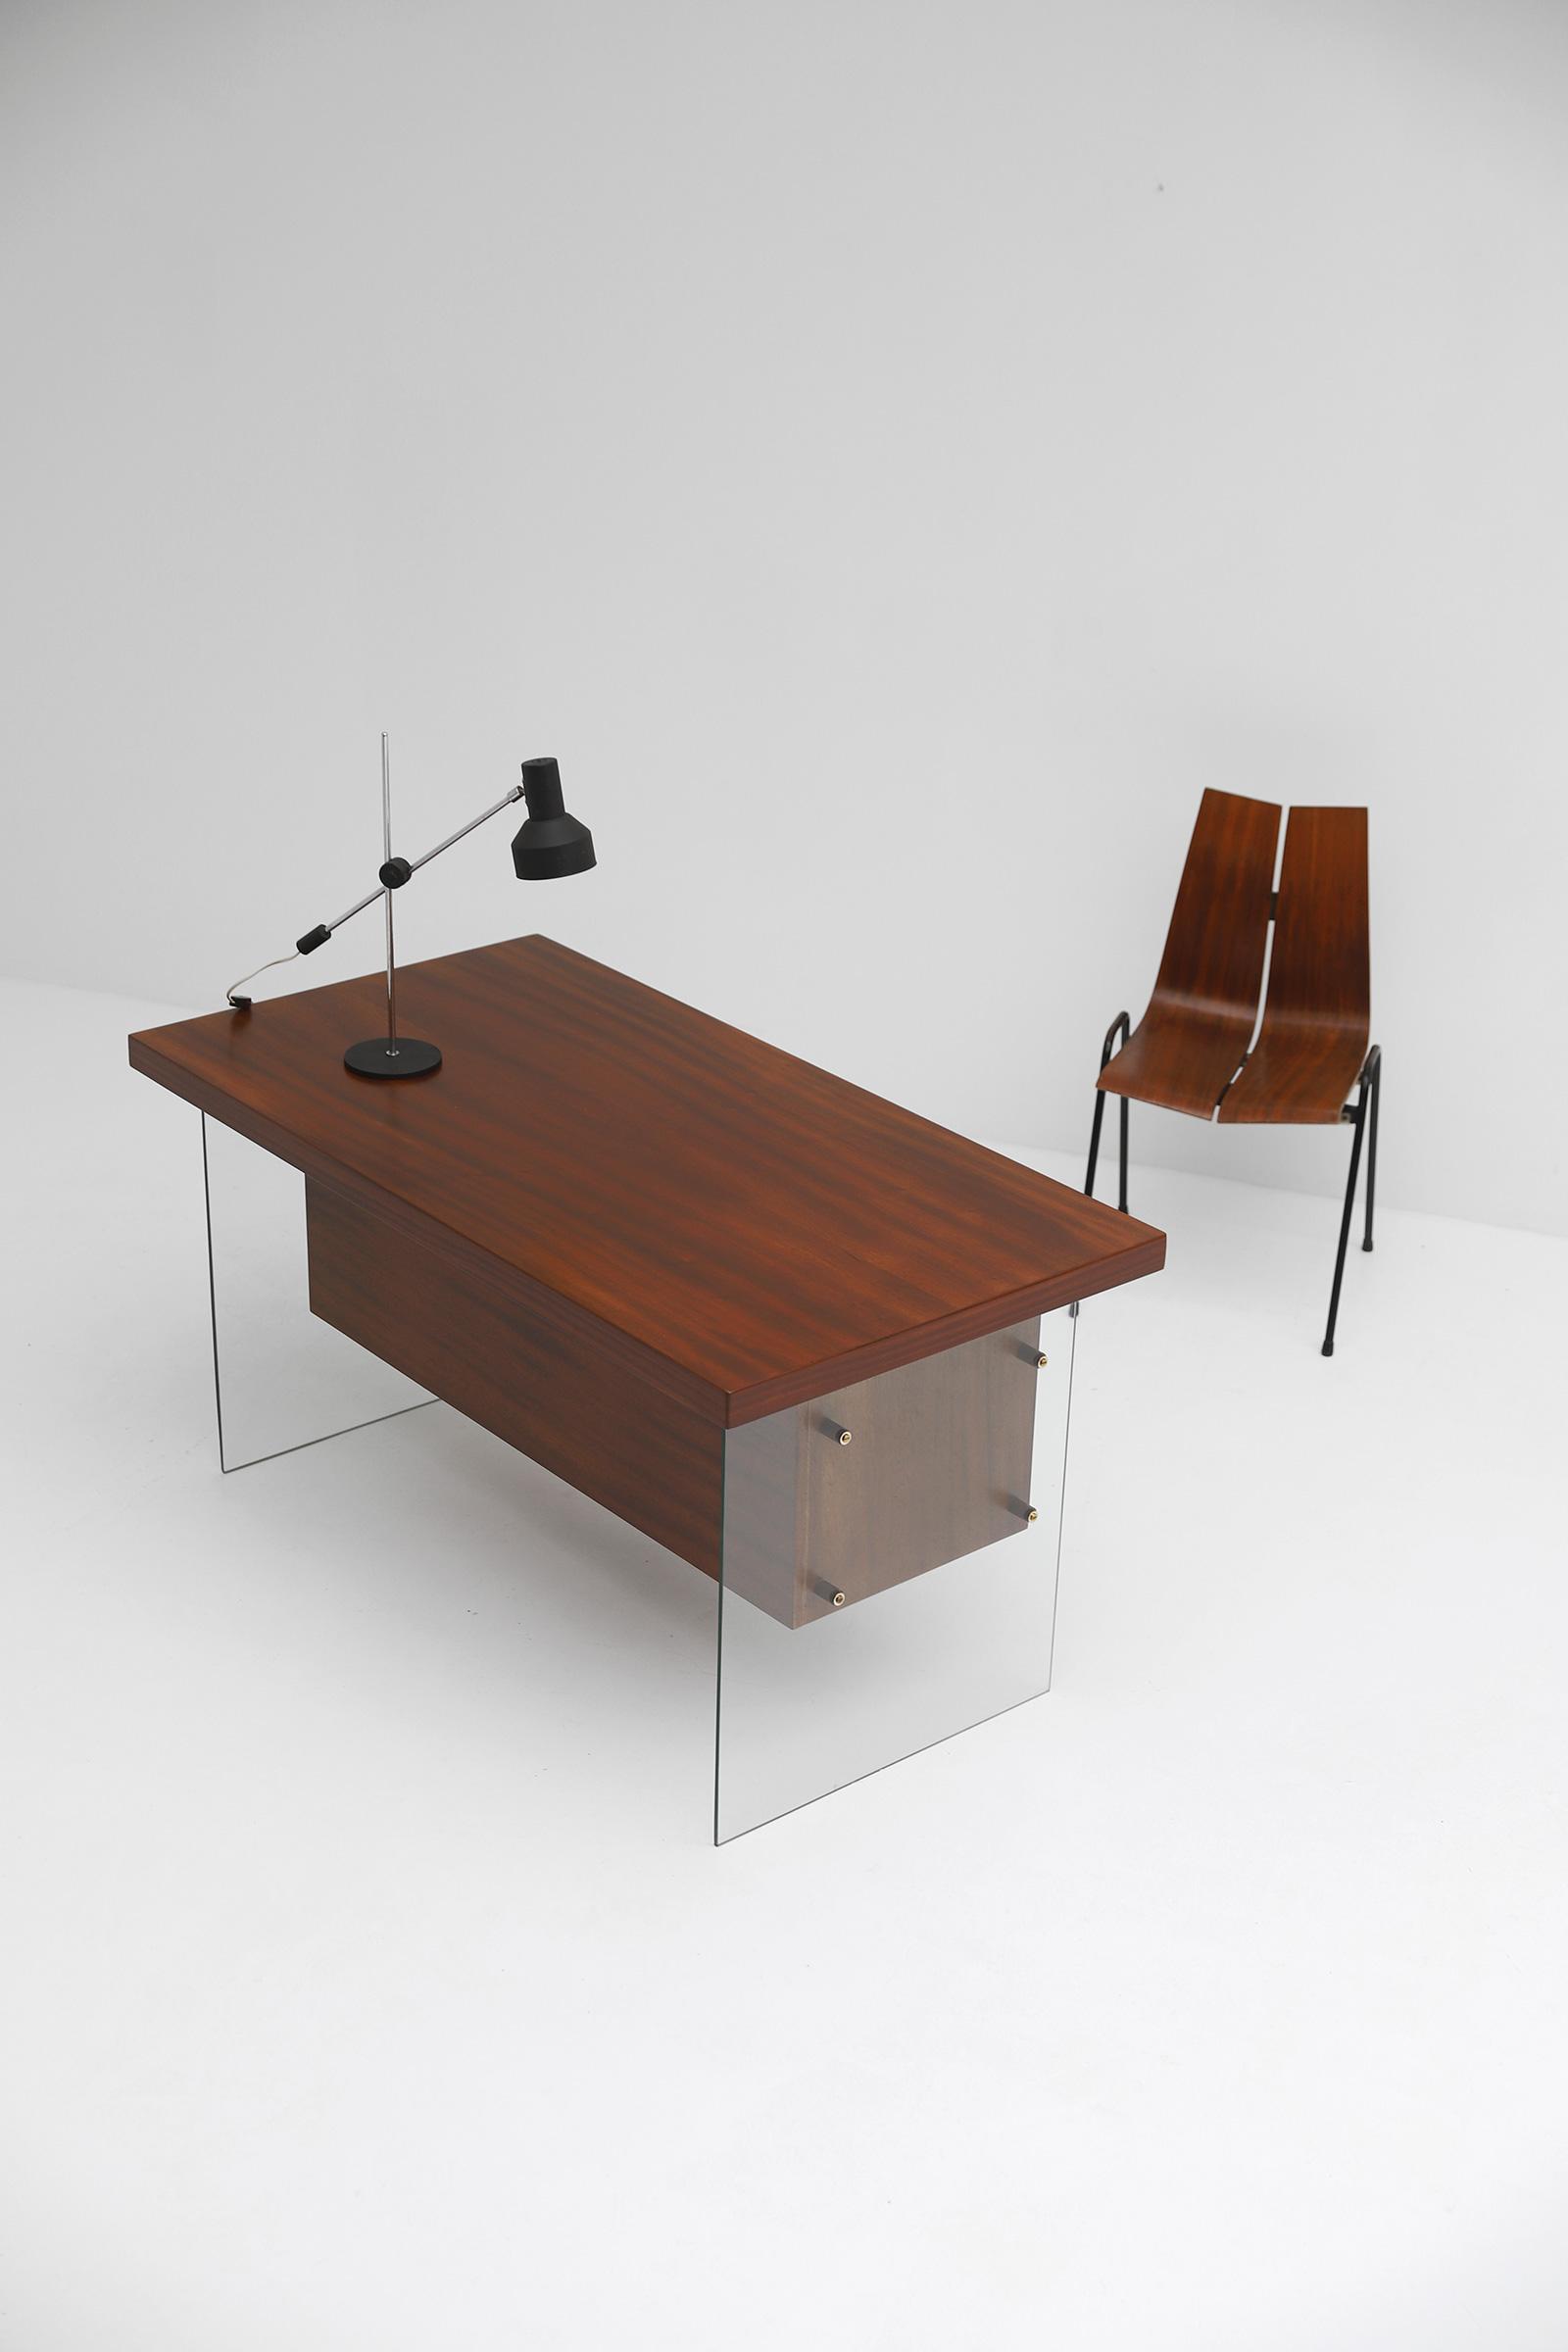 Modernist desk in the manner of Jacques Dumond, 1950simage 5